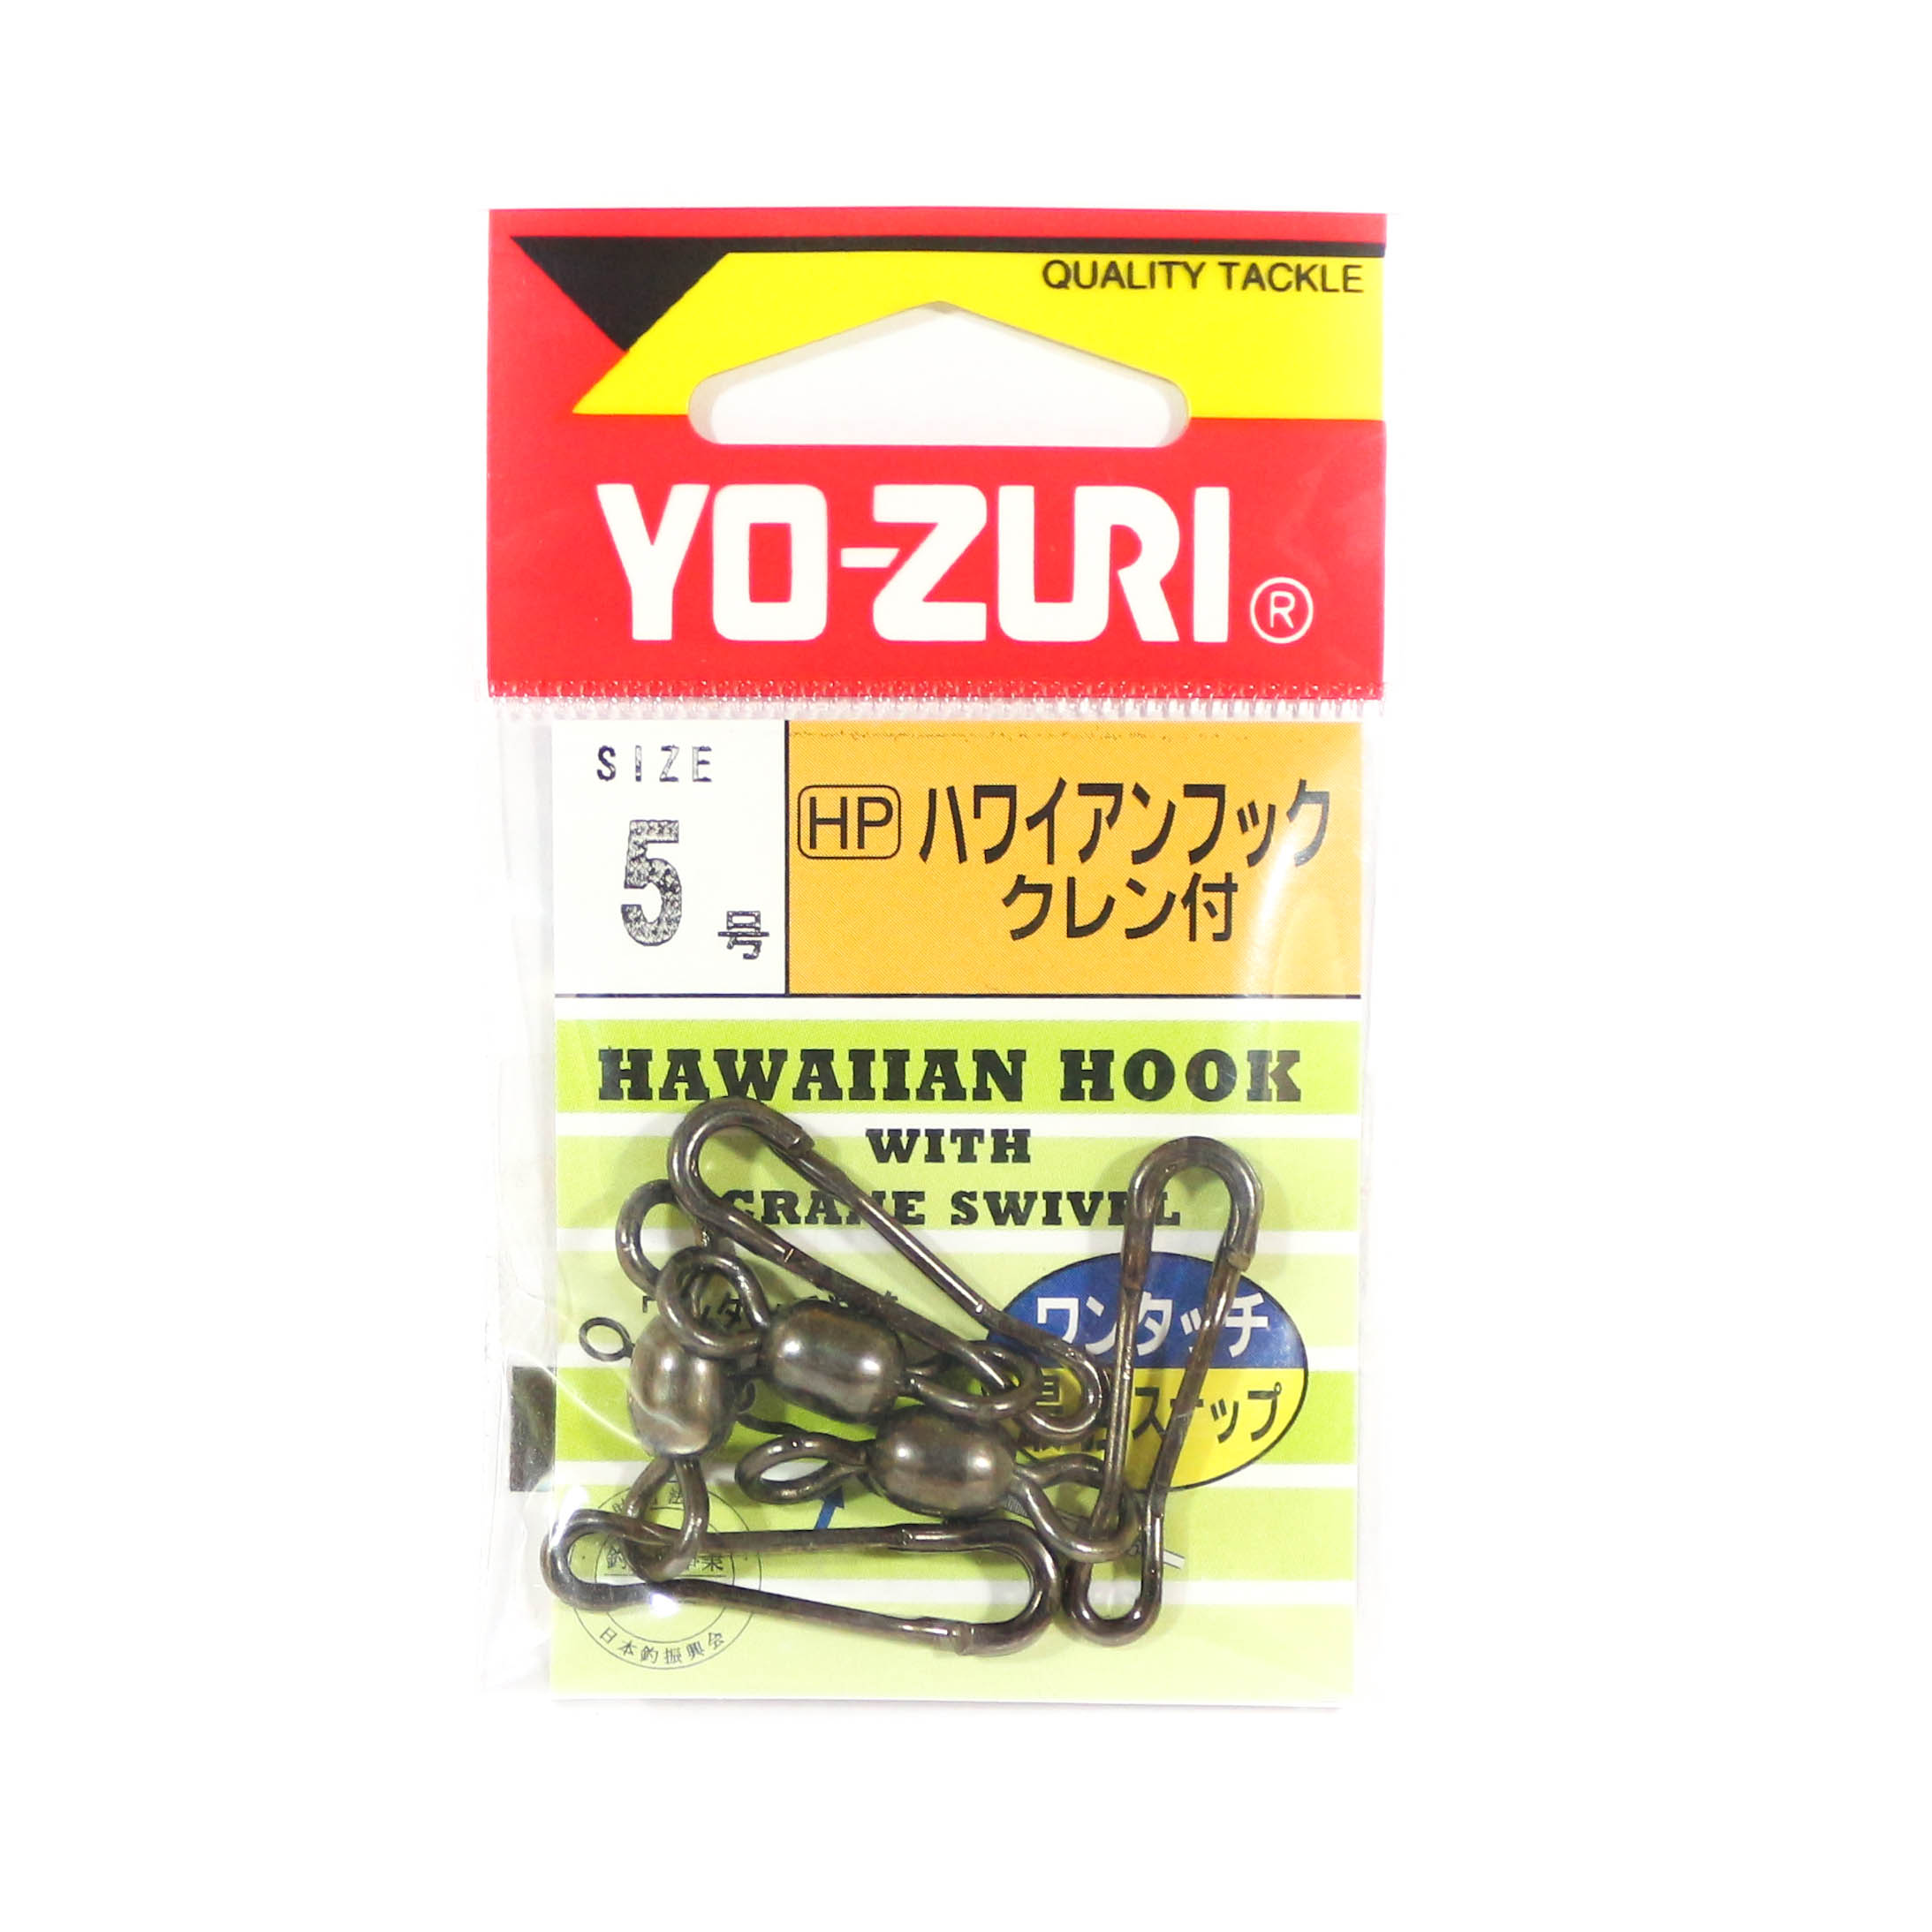 Yo Zuri Hawaiian Snap With Crane Swivel Black Size 5 J670 (6704)